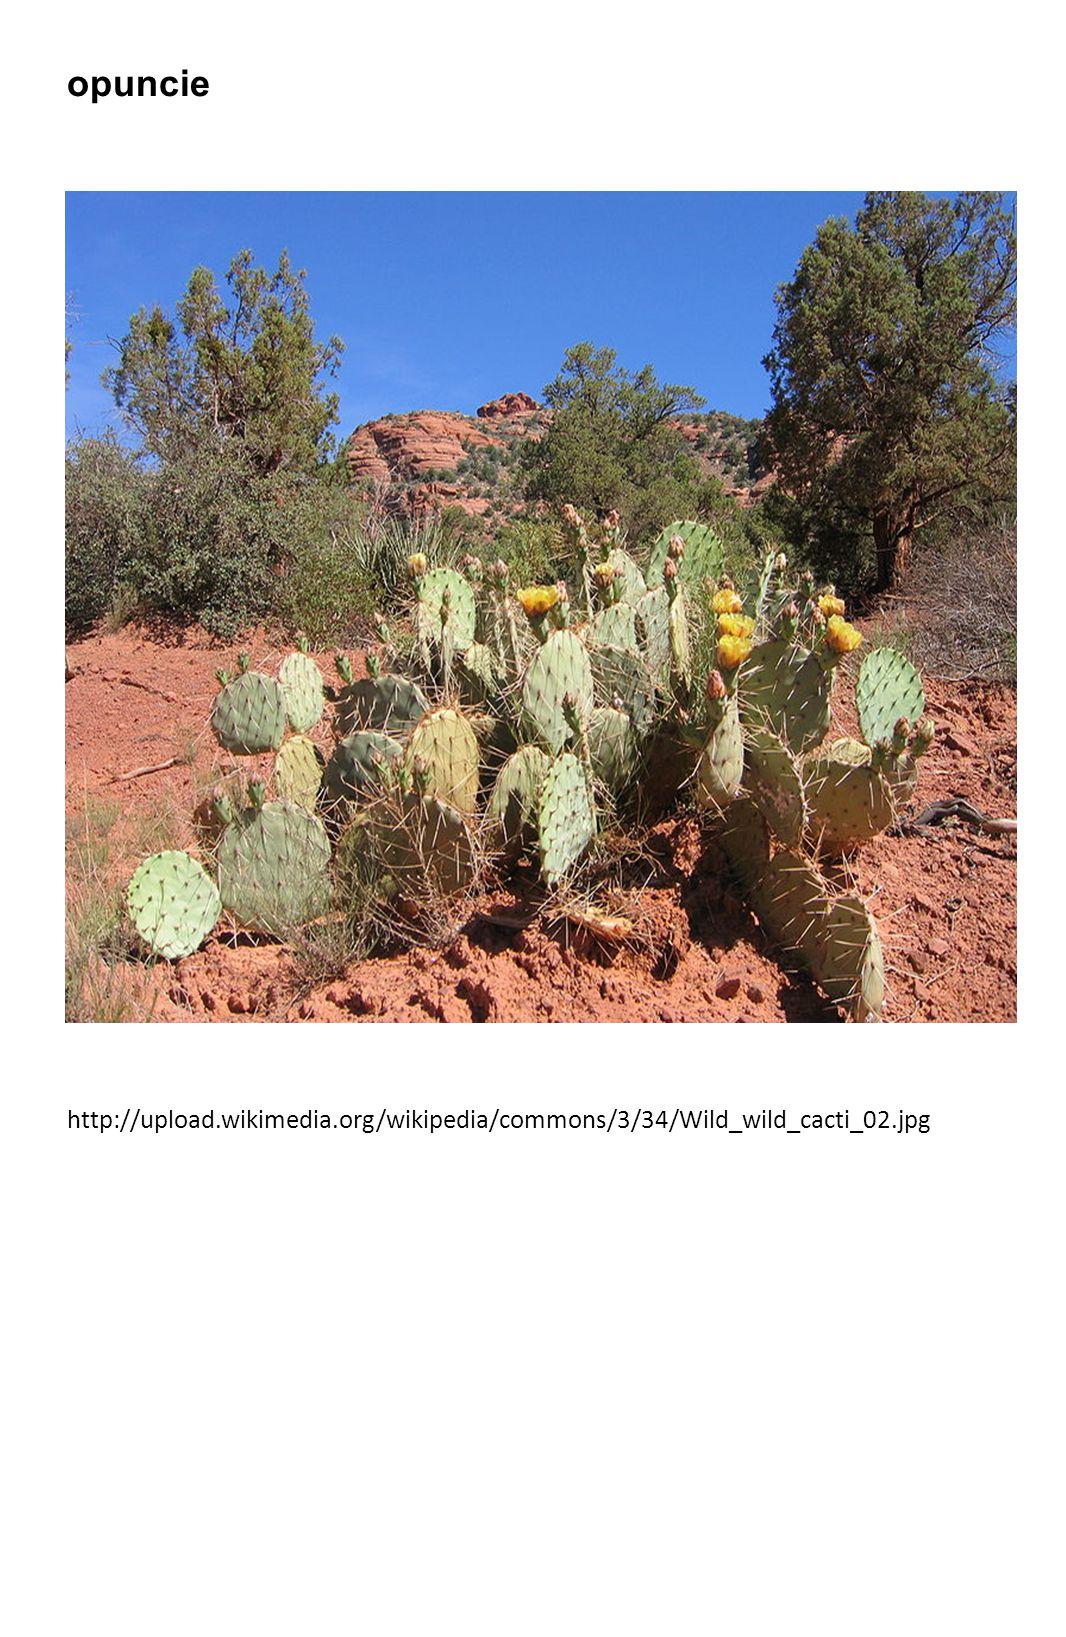 opuncie http://upload.wikimedia.org/wikipedia/commons/3/34/Wild_wild_cacti_02.jpg